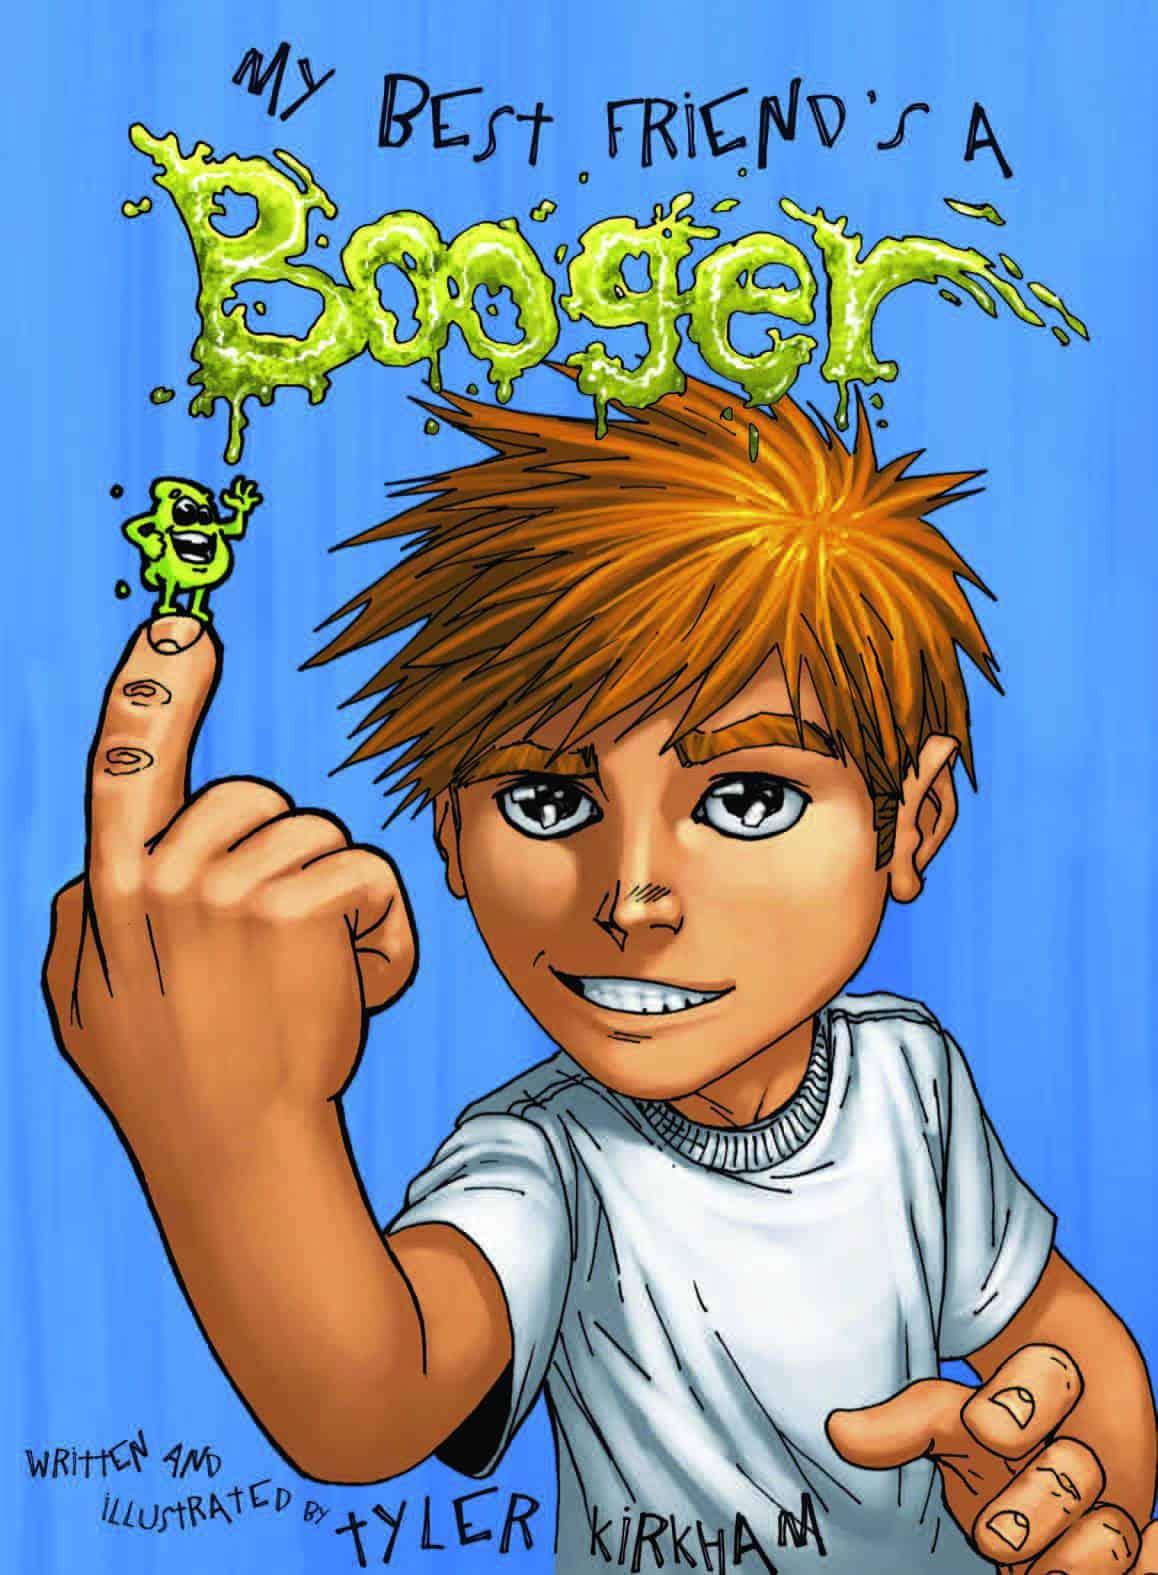 My Best Friend's A Booger 2